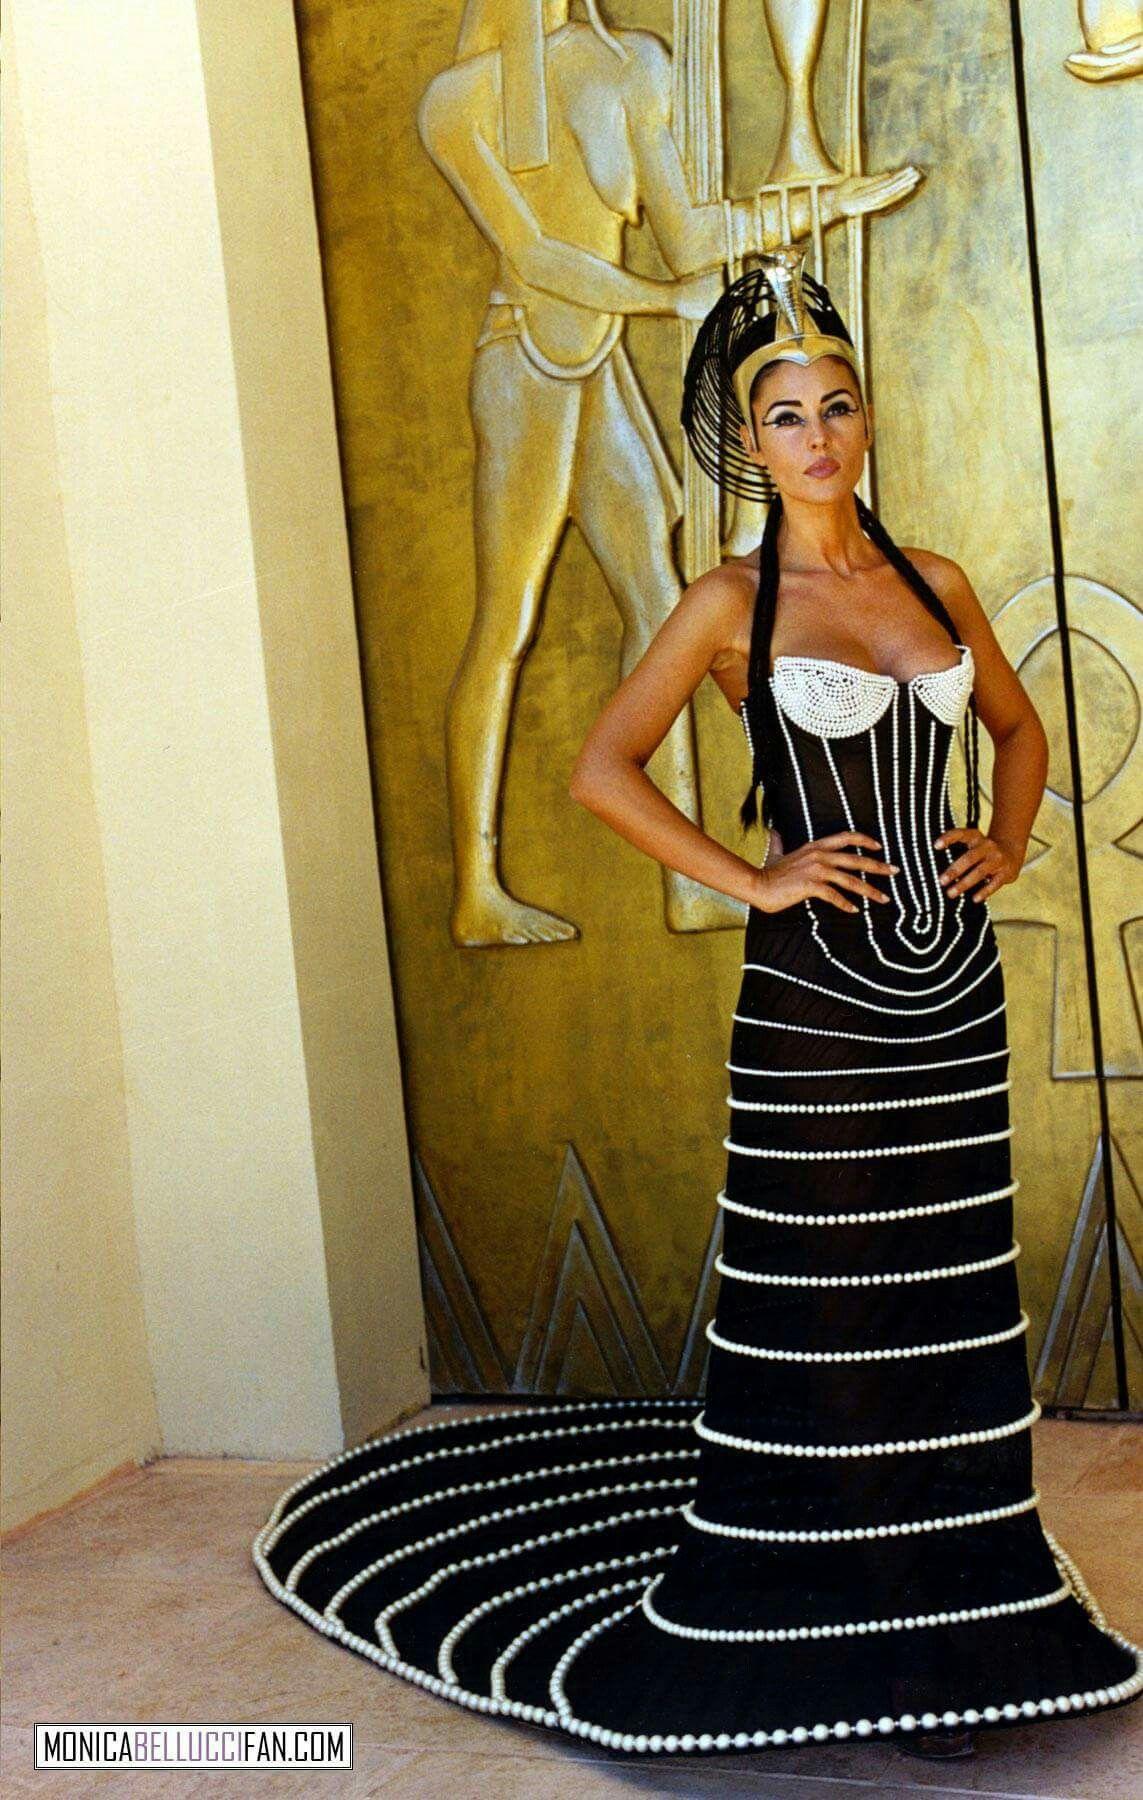 Monica Bellucci Kleopatra Monika Belluchchi Platya